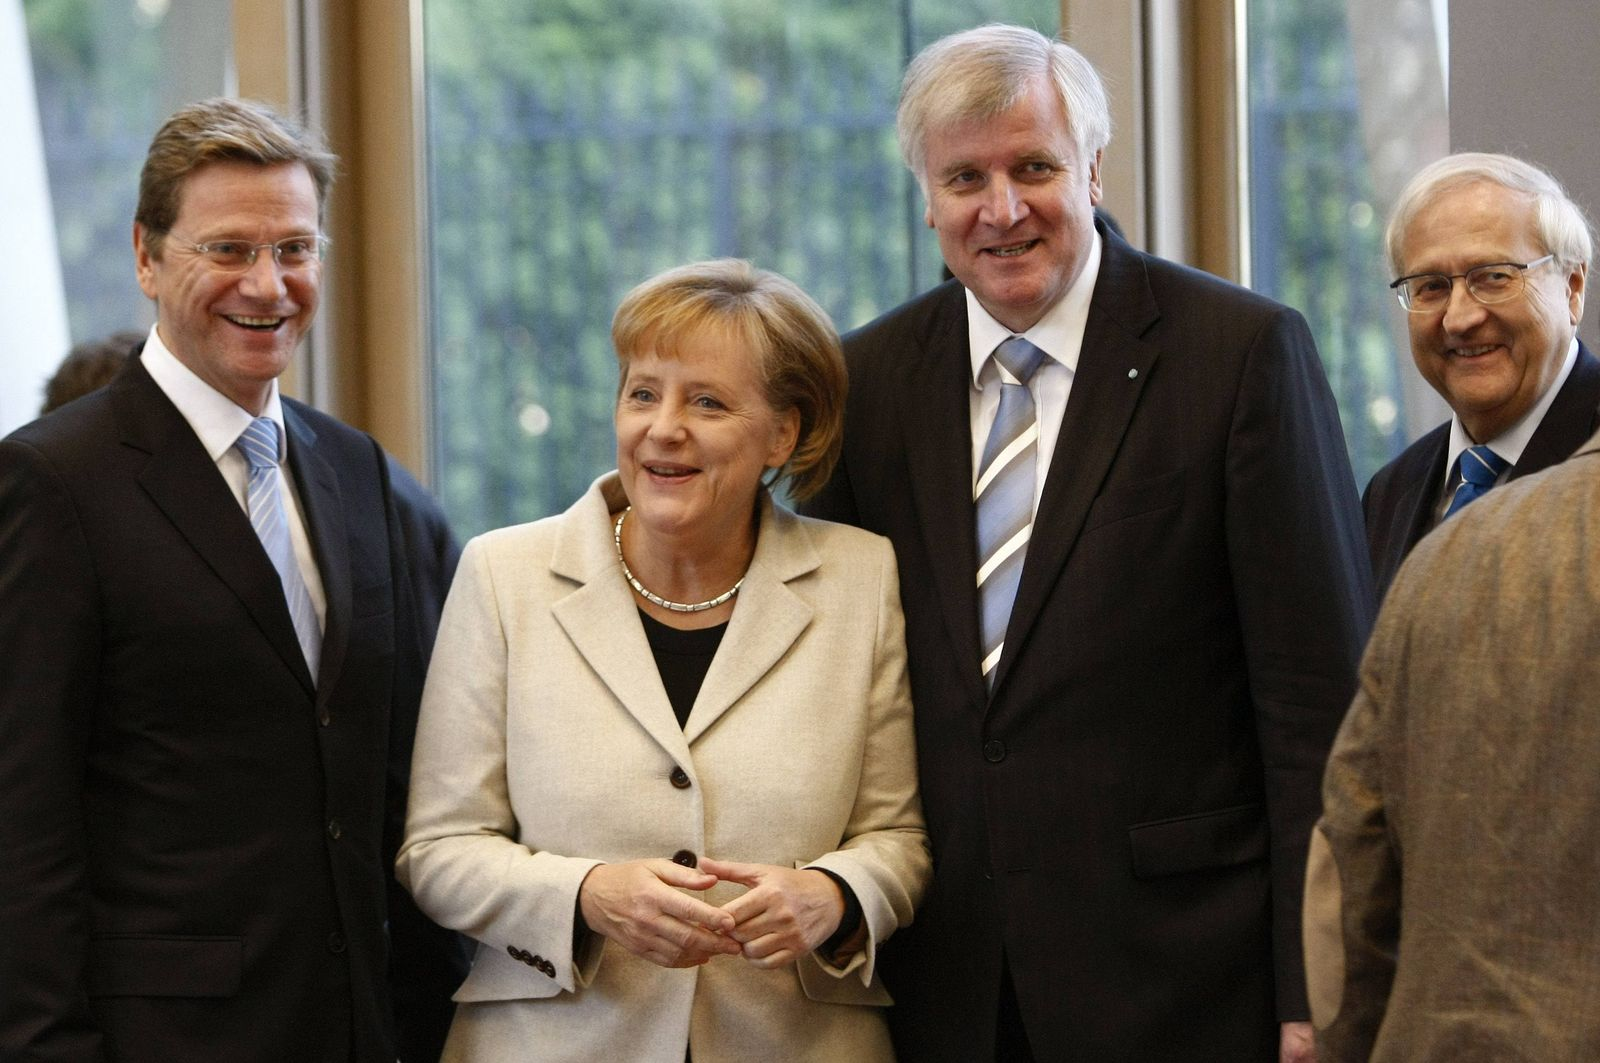 Merkel / Westerwelle / Seehofer